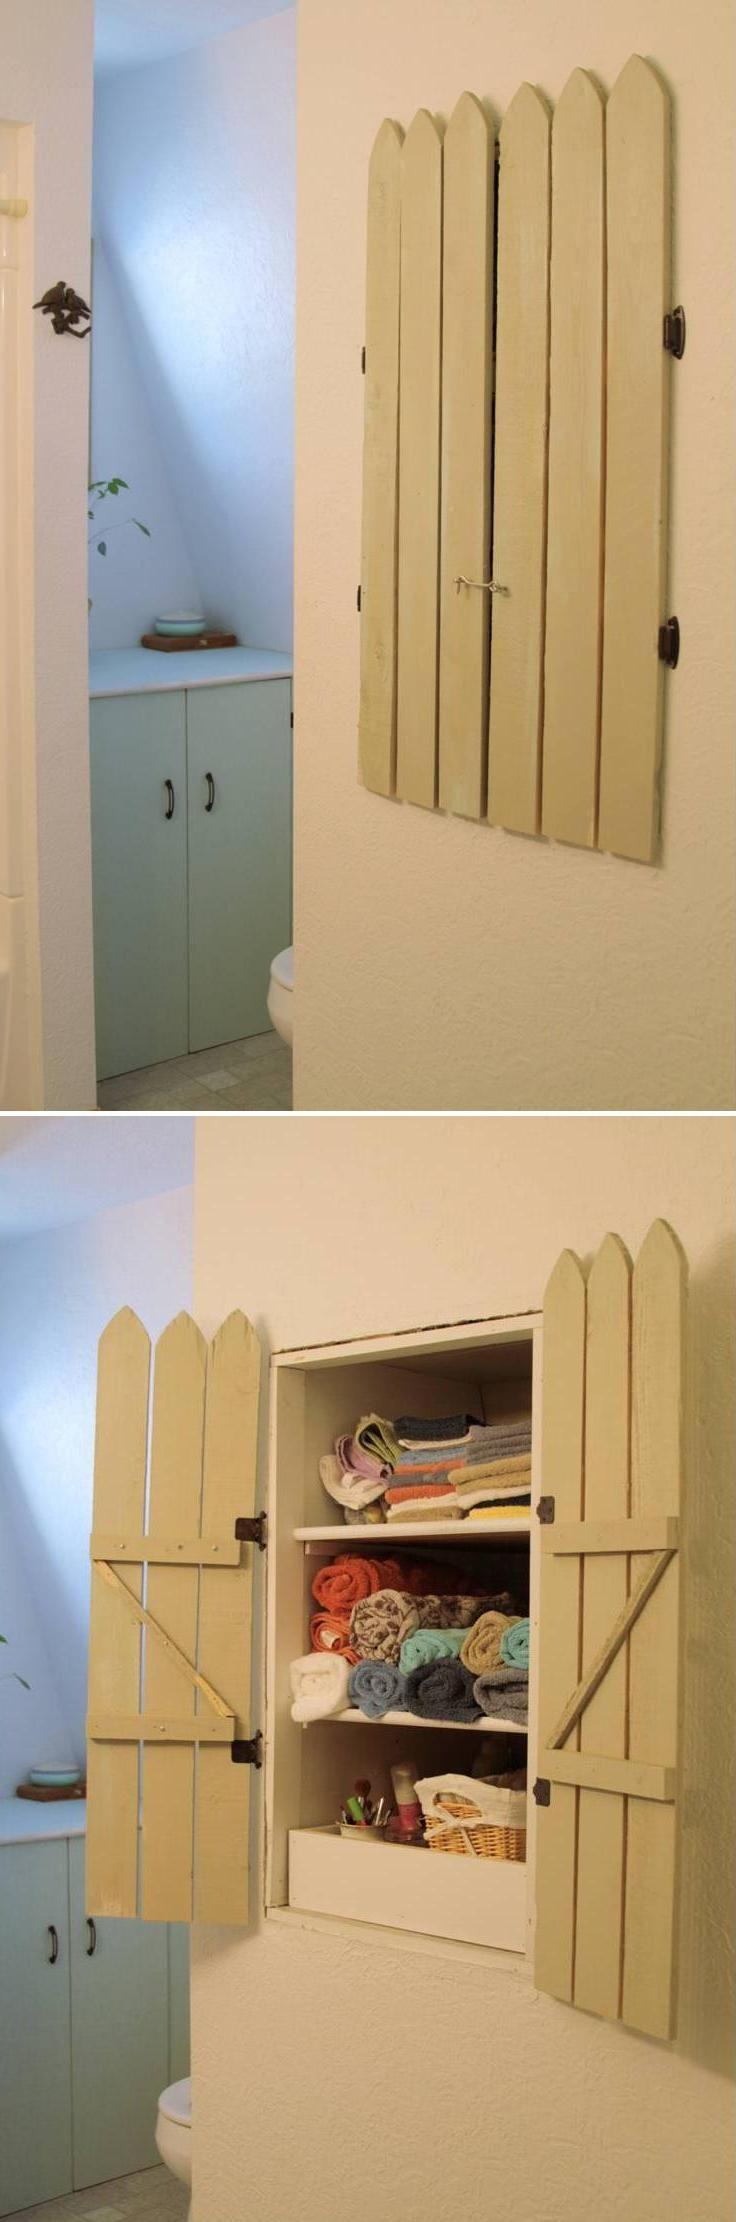 Wonderful Bathroom Storage Solutions Title Image